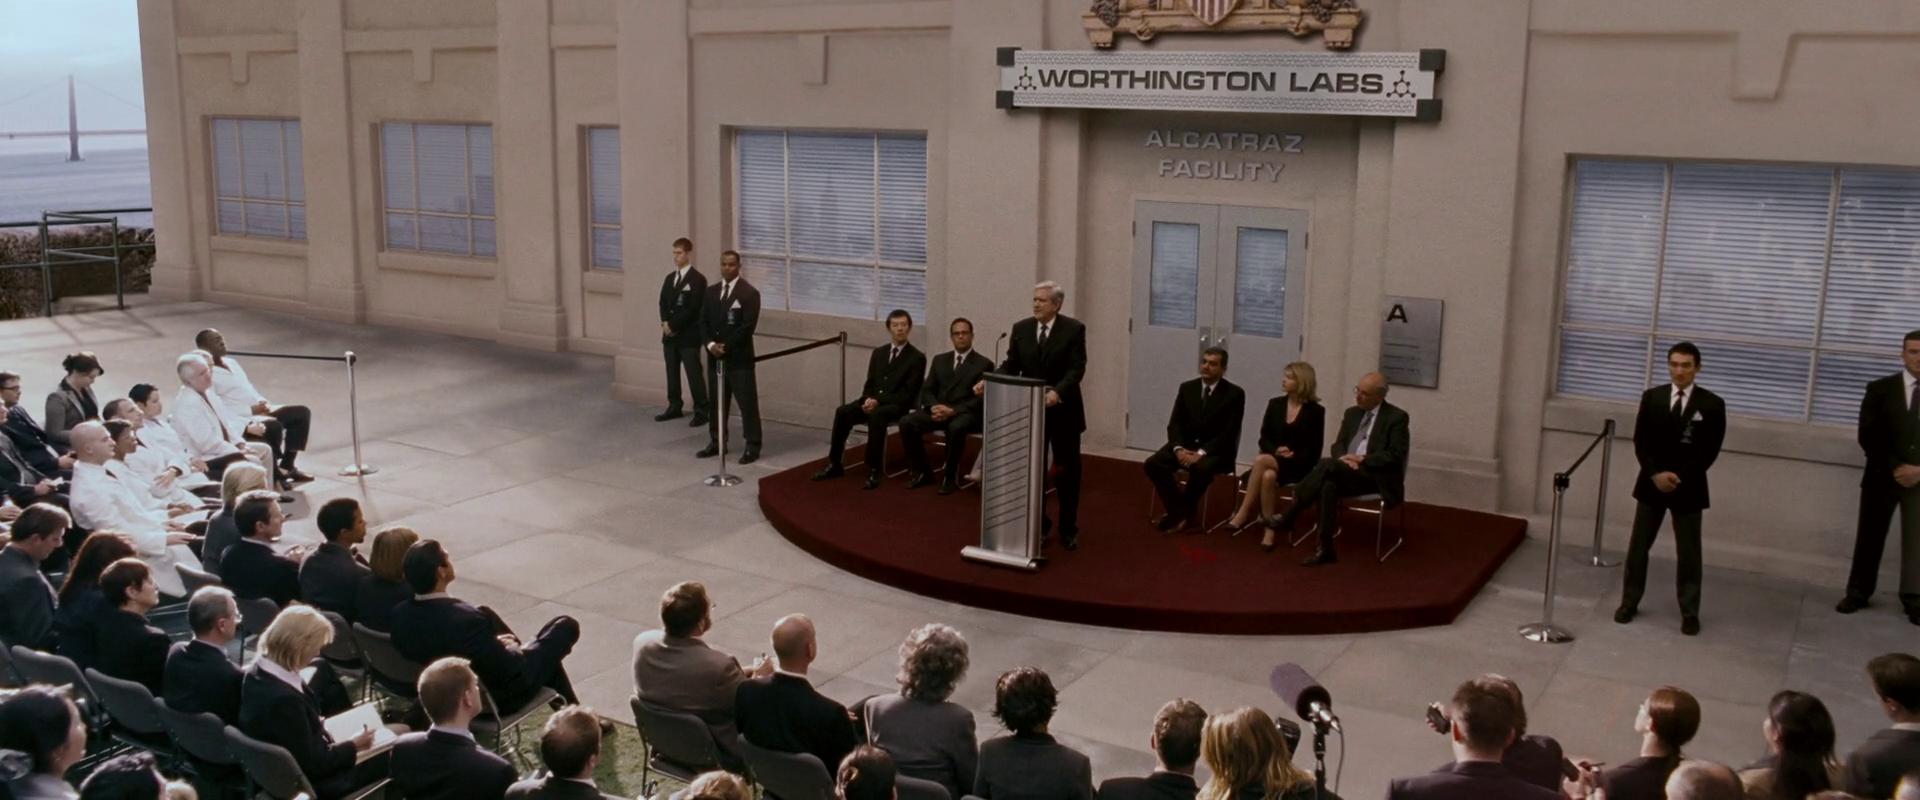 Worthington Labs